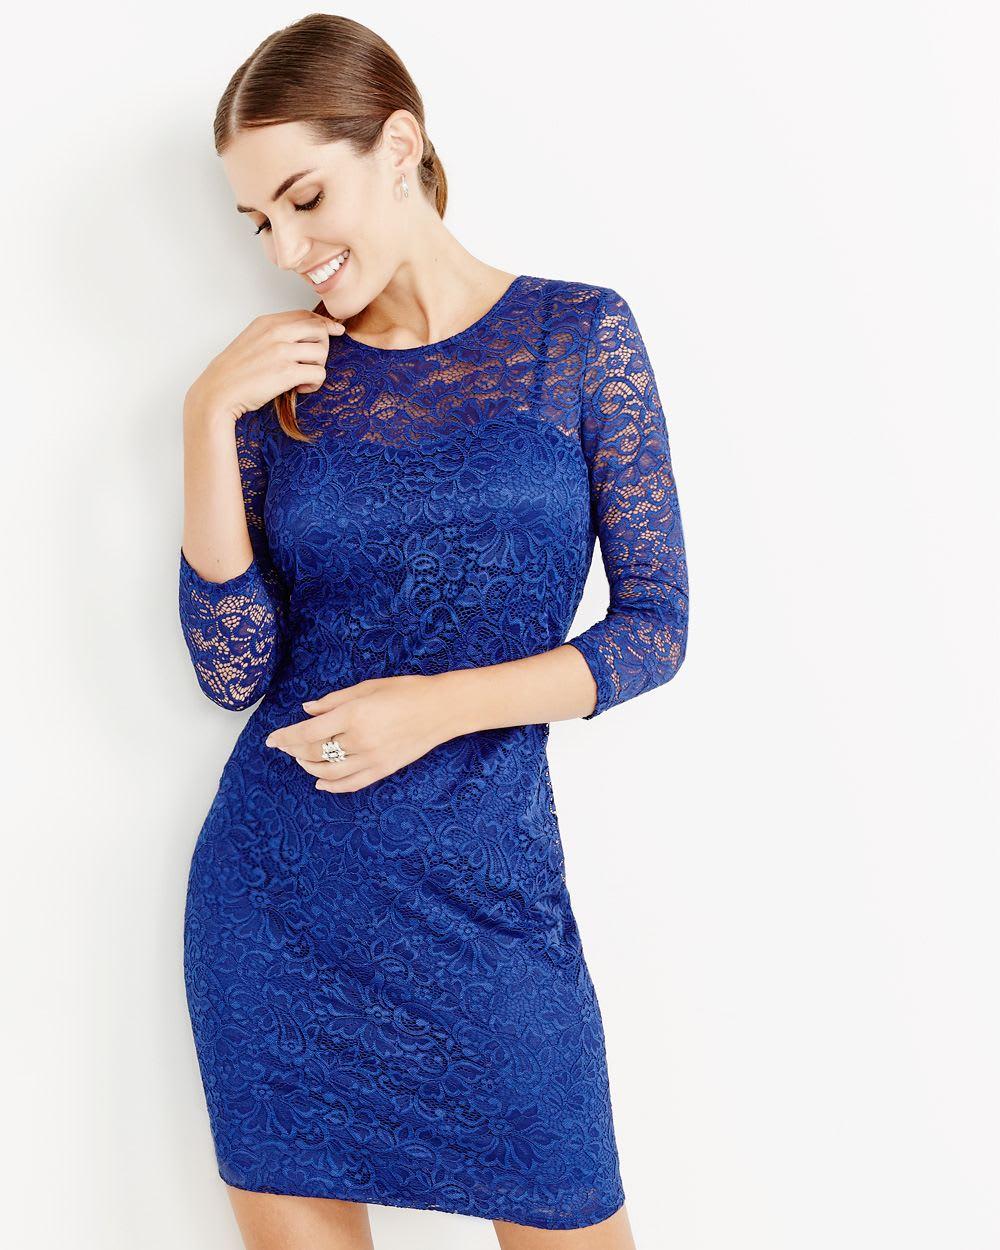 ¾ Sleeve Bodycon Dress